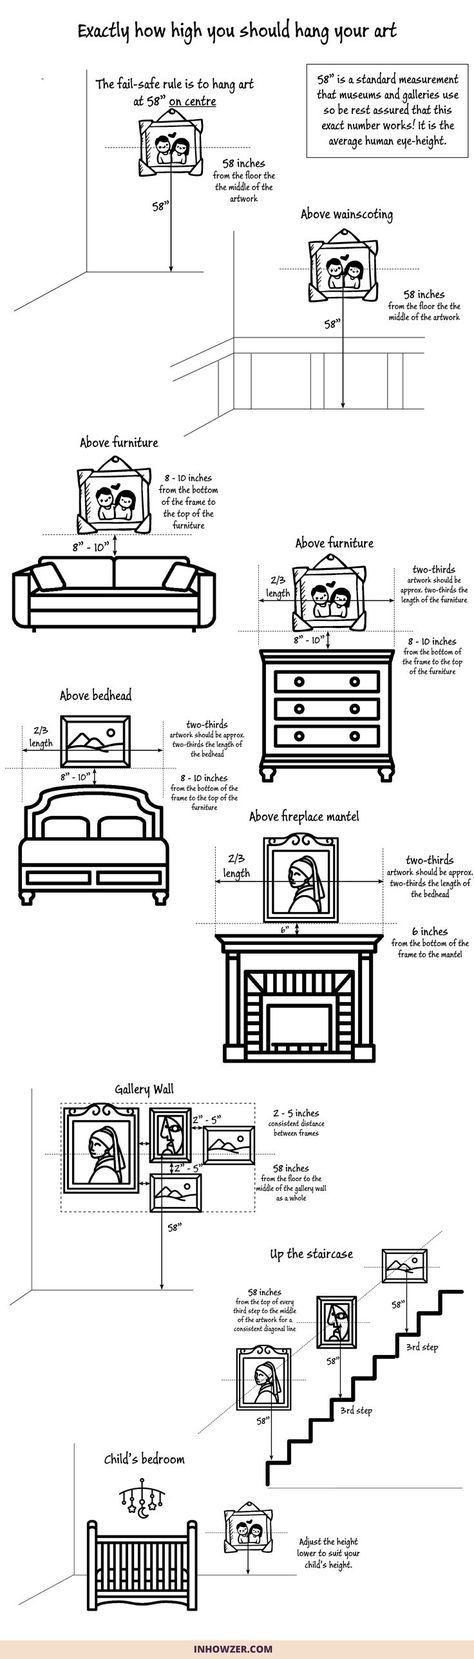 best 25 arranging pictures ideas on pinterest picture placement on wall photo arrangements. Black Bedroom Furniture Sets. Home Design Ideas